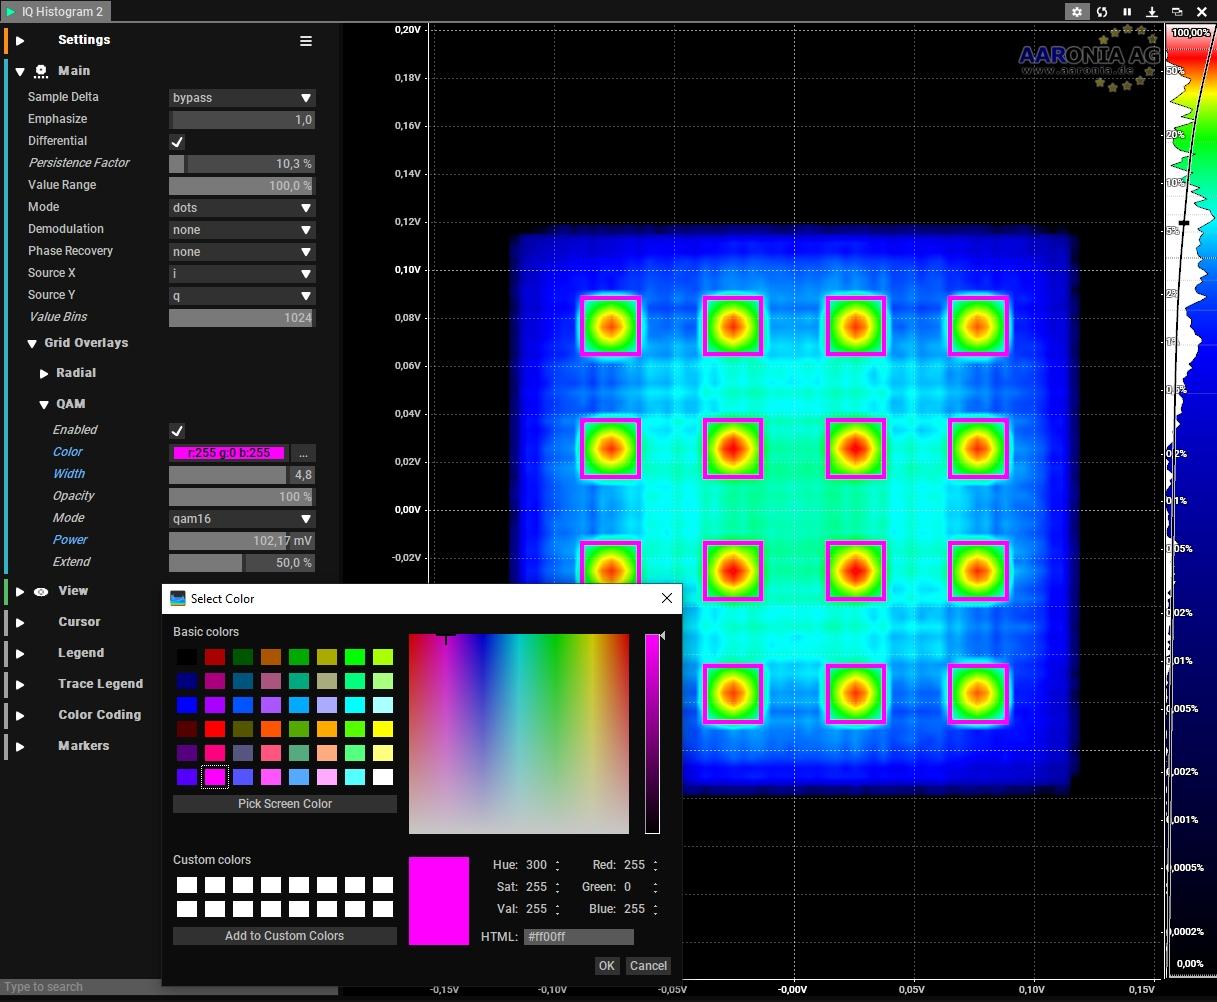 IQ Constellation Grid Overlay